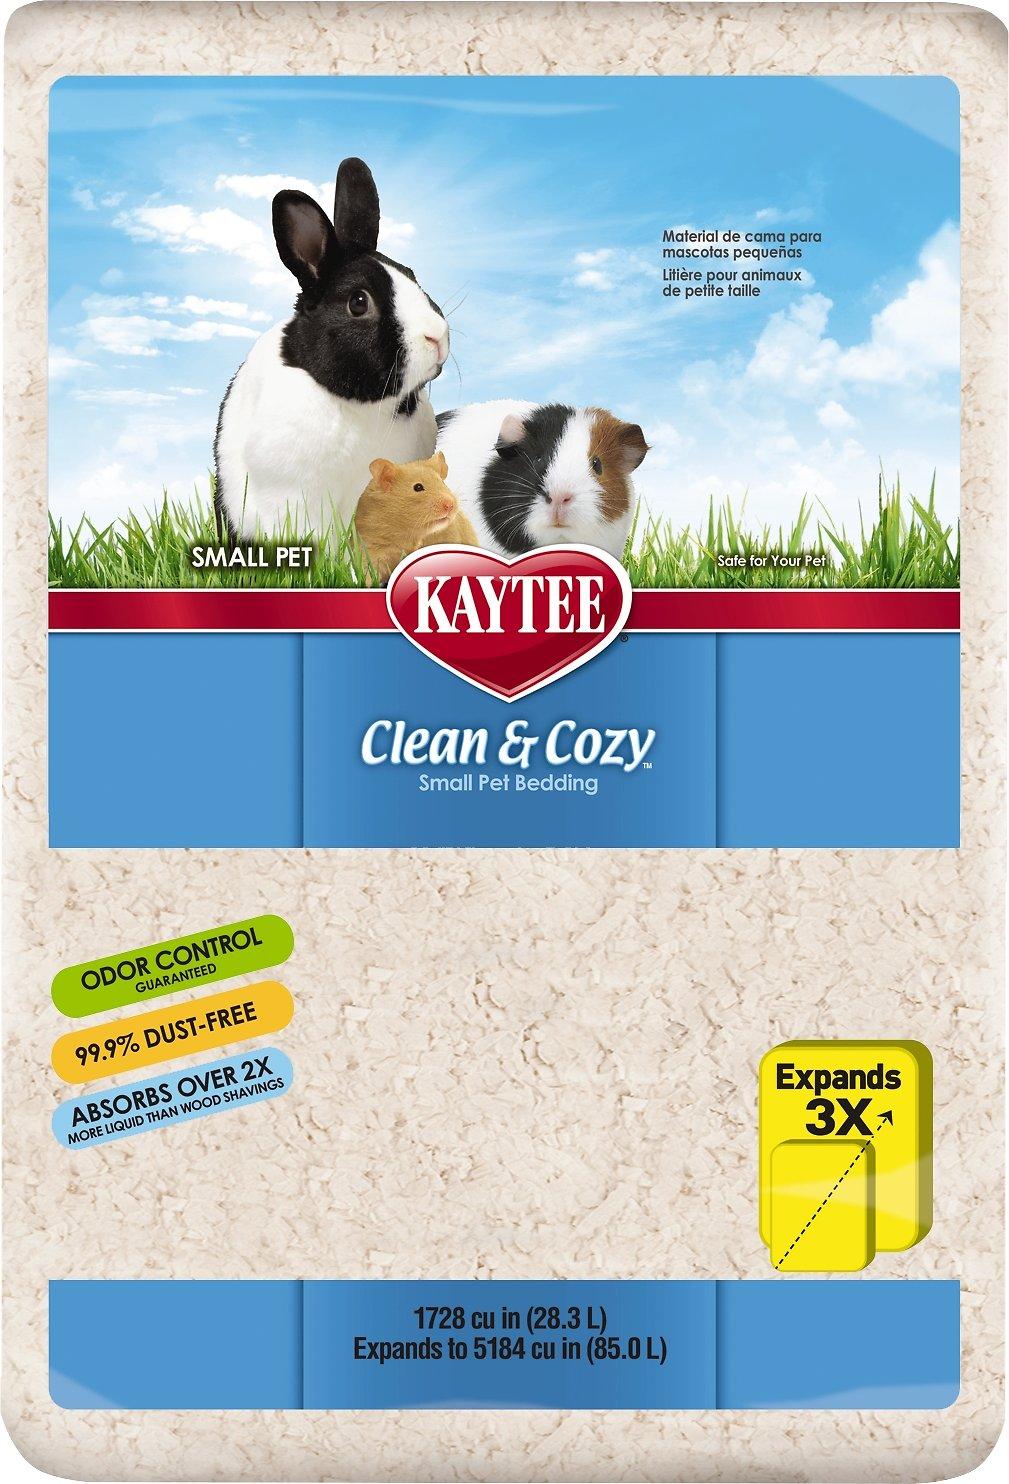 Kaytee Clean & Cozy Small Animal Bedding Image